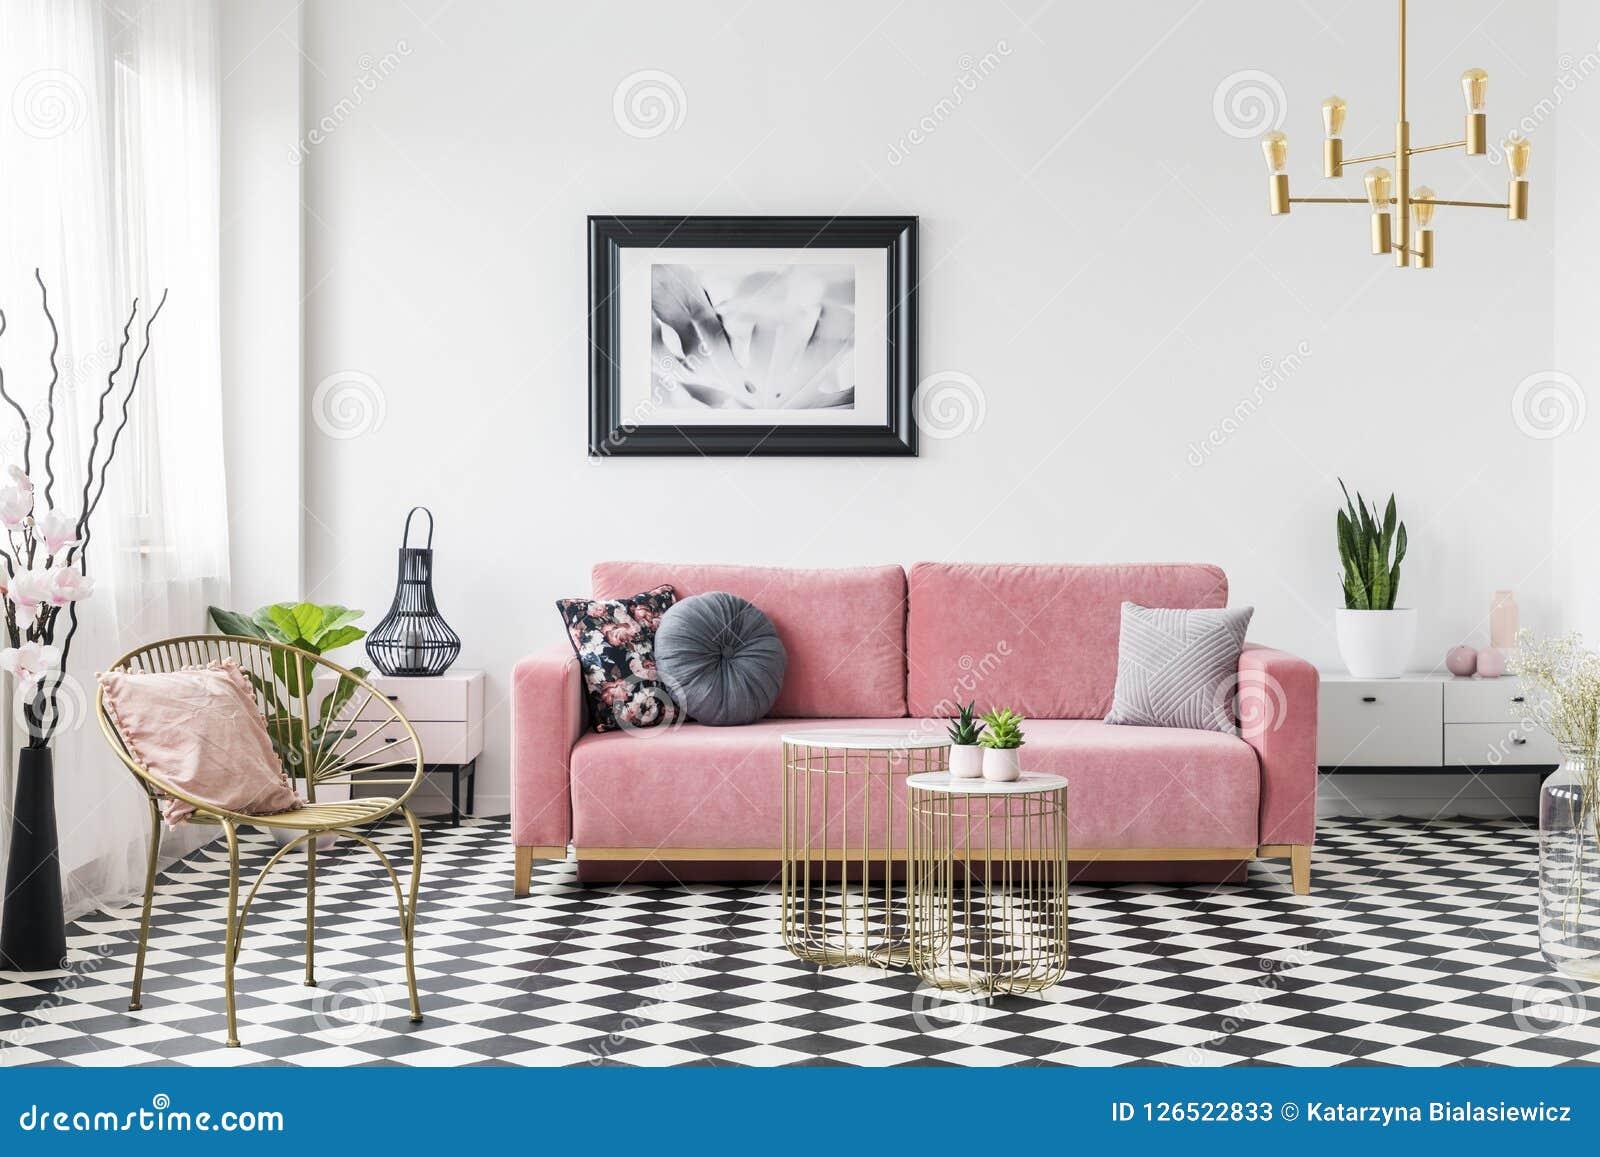 Affiche boven roze bank in woonkamerbinnenland met gouden leunstoel op geruite vloer Echte foto